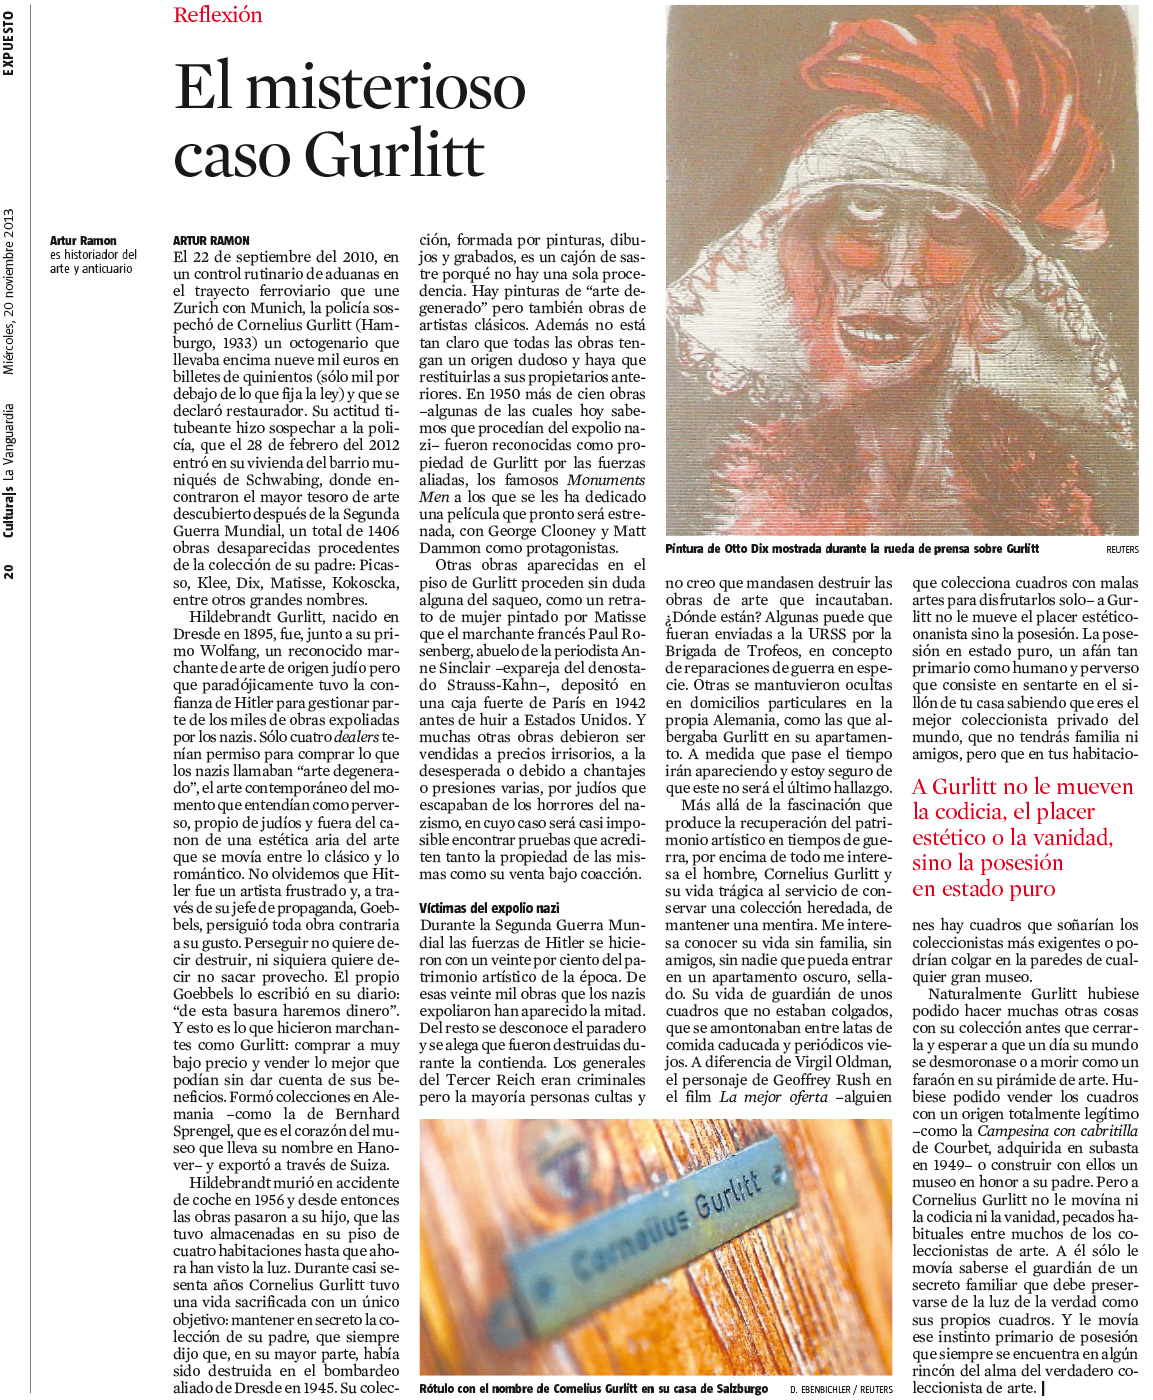 El misteriós cas Gurlitt (La Vanguardia)